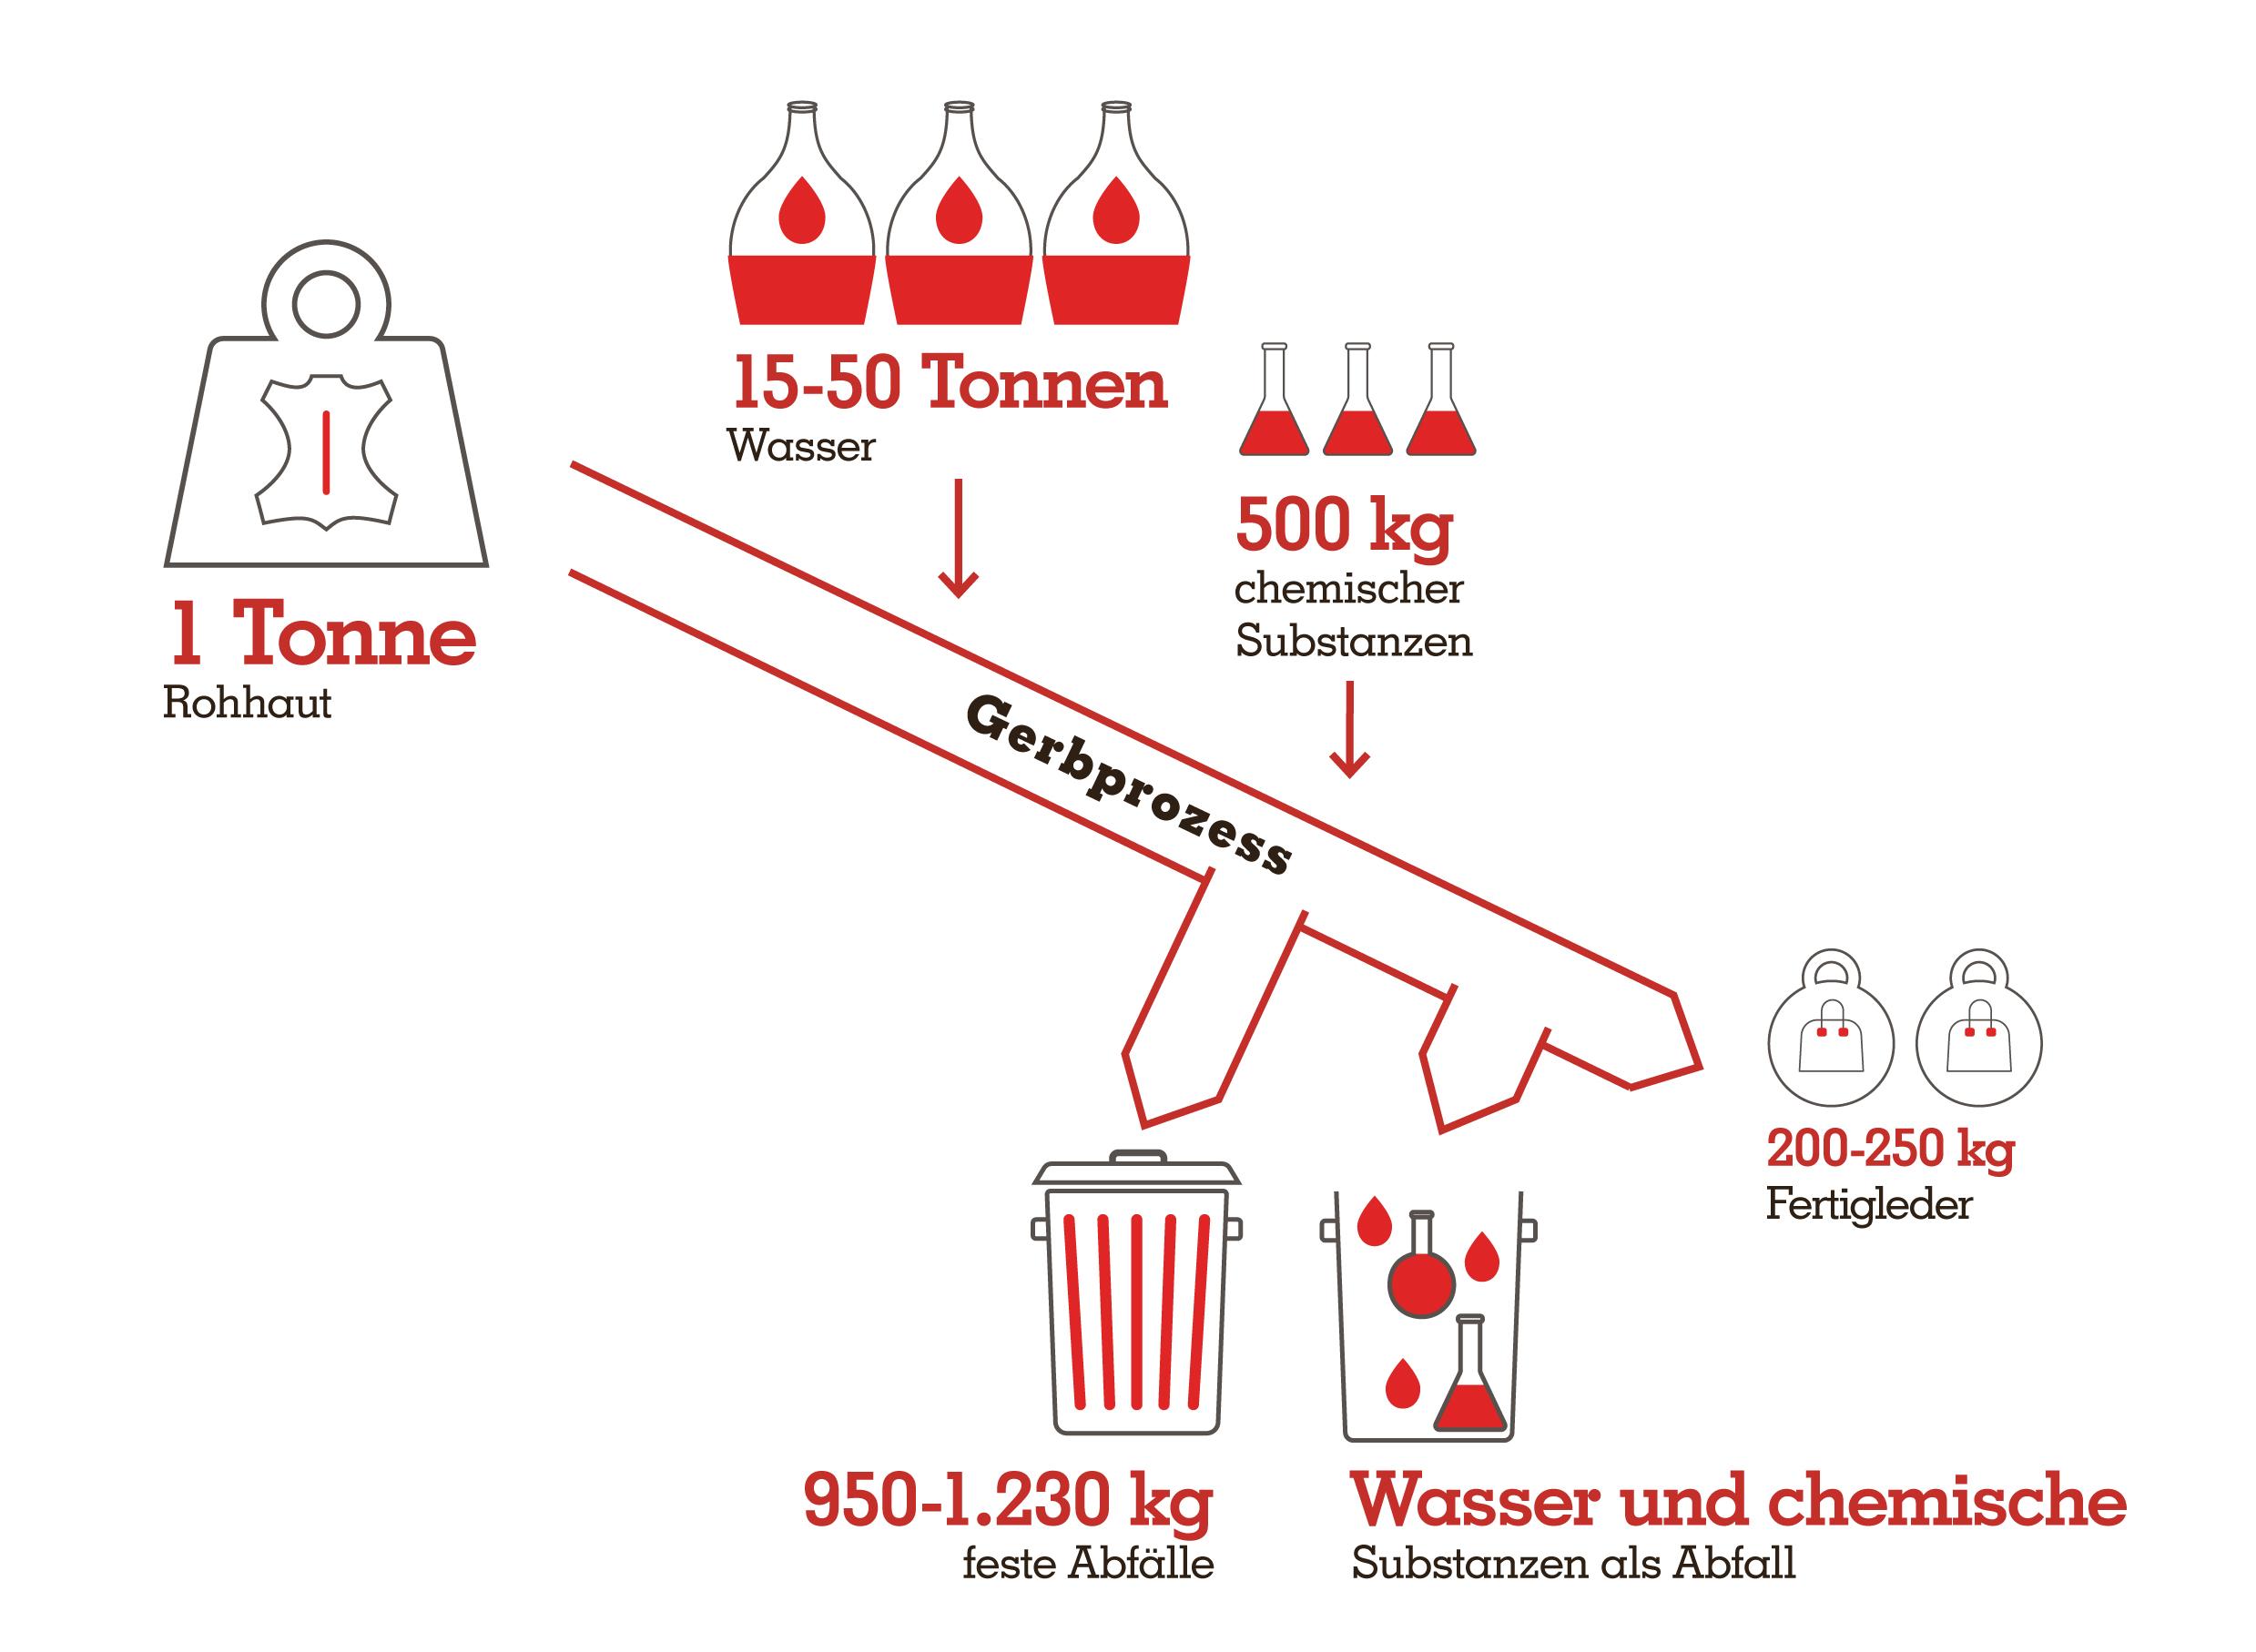 Umweltbelastung durch Lederproduktion